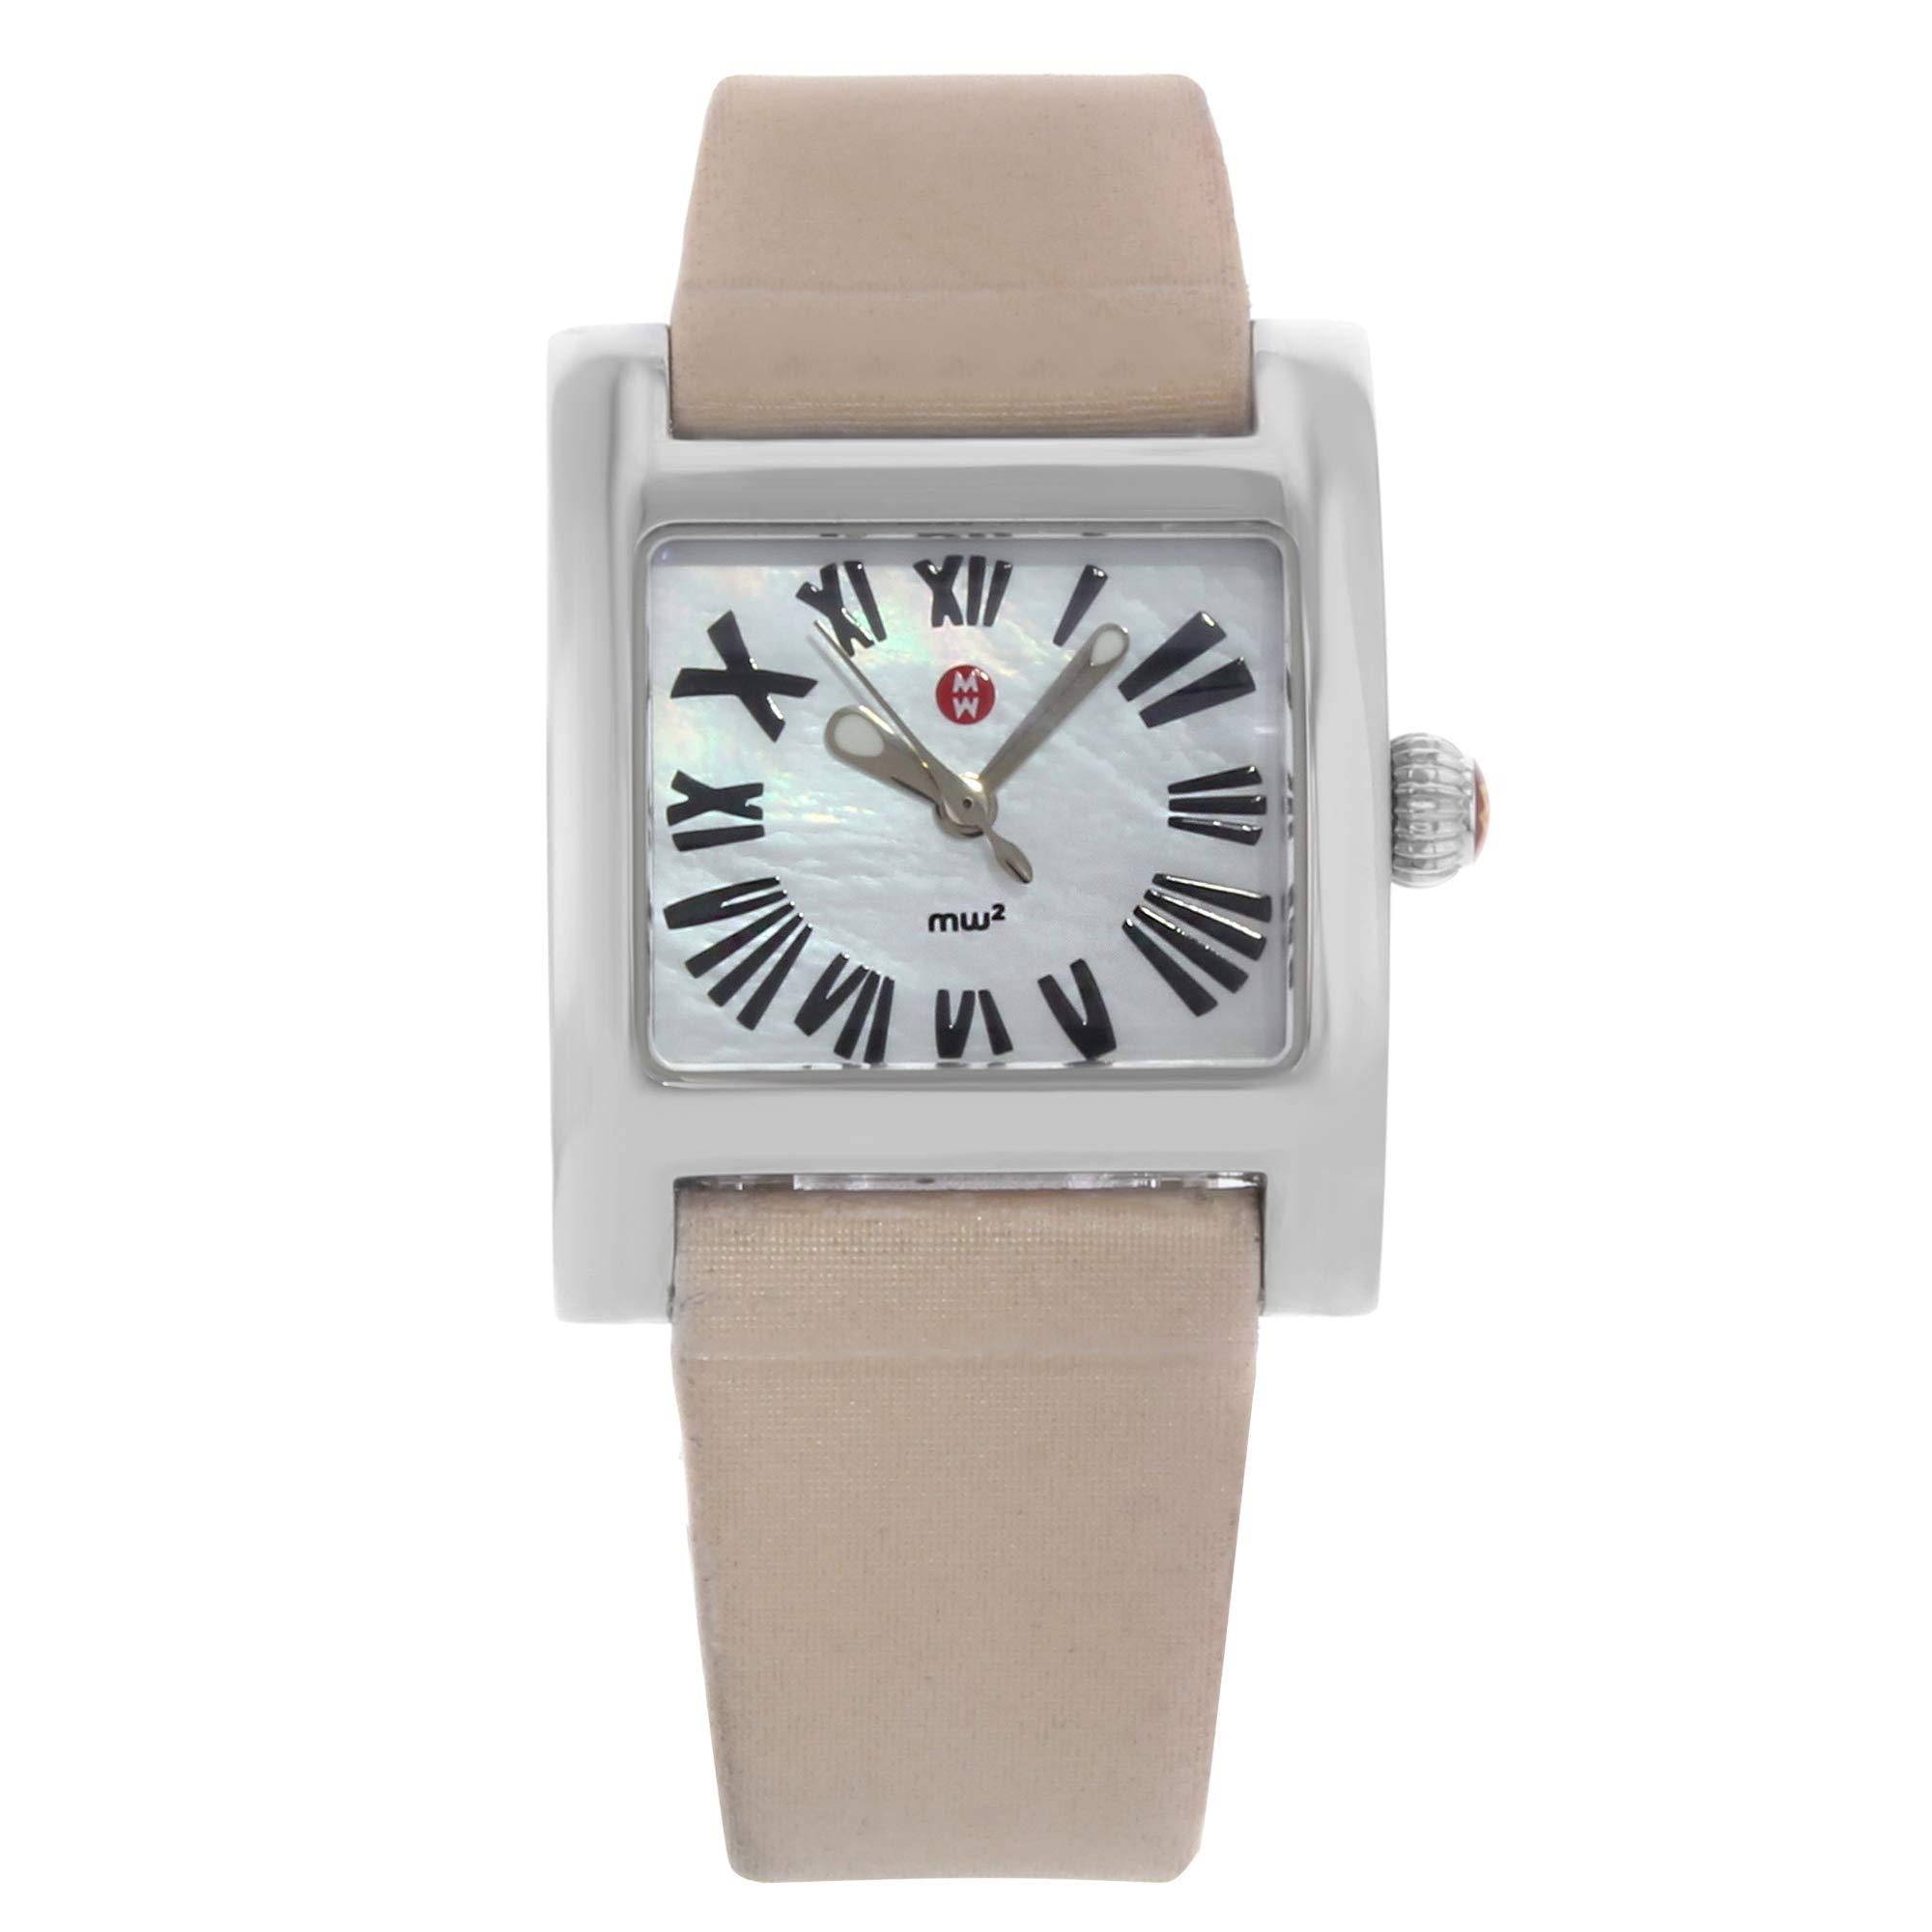 Michele MW2 Quartz Female Watch EX1072-54E (Certified Pre-Owned) by MICHELE